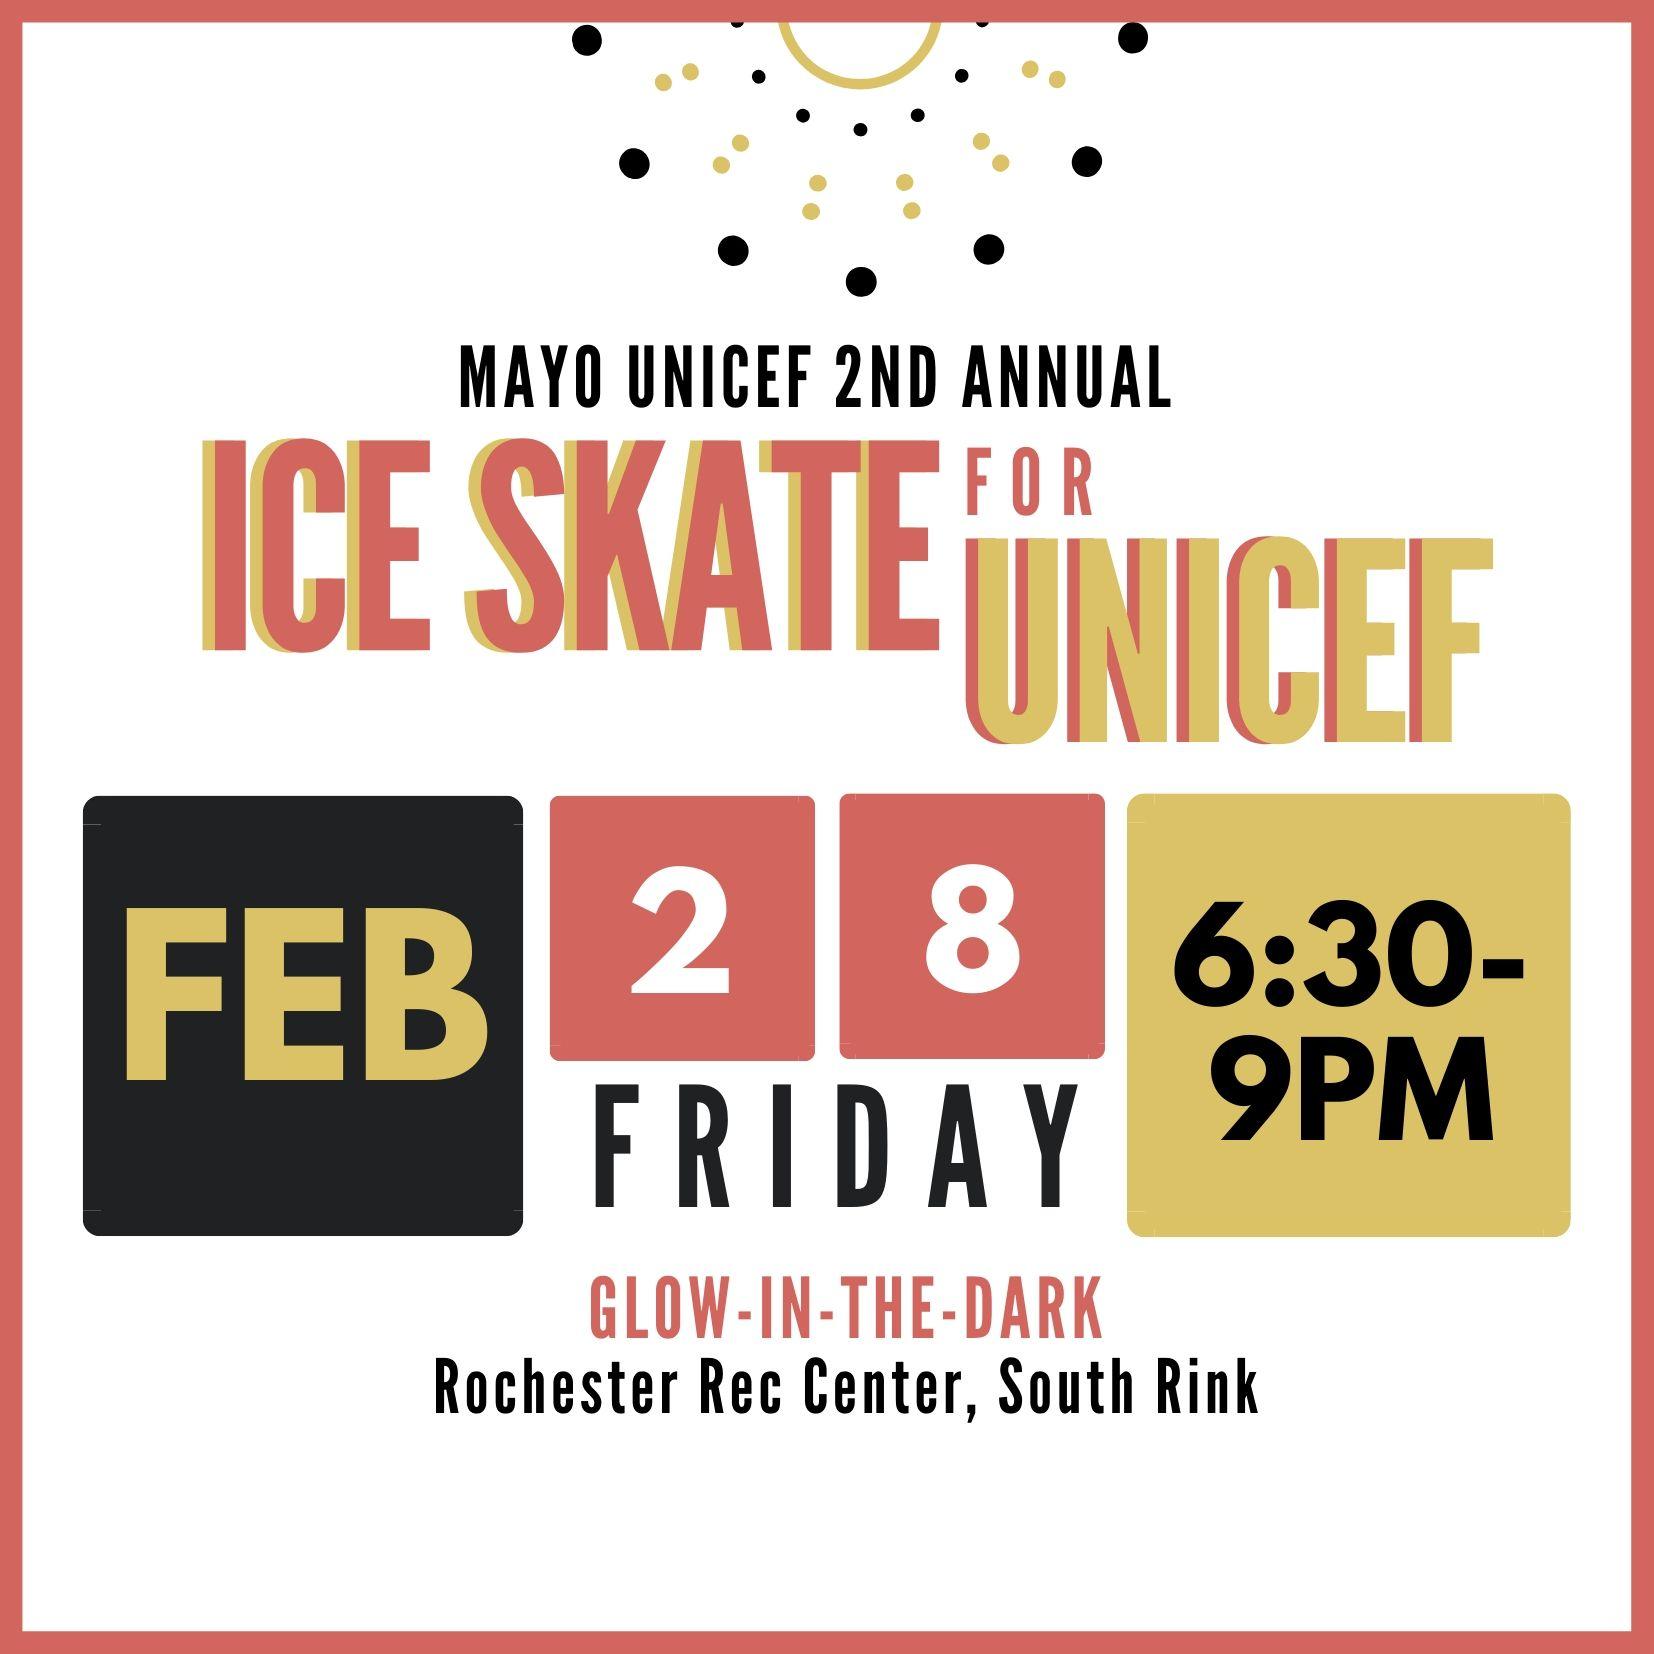 Mayo UNICEF's 2nd Annual Glow-in-the-Dark Ice Skate Night